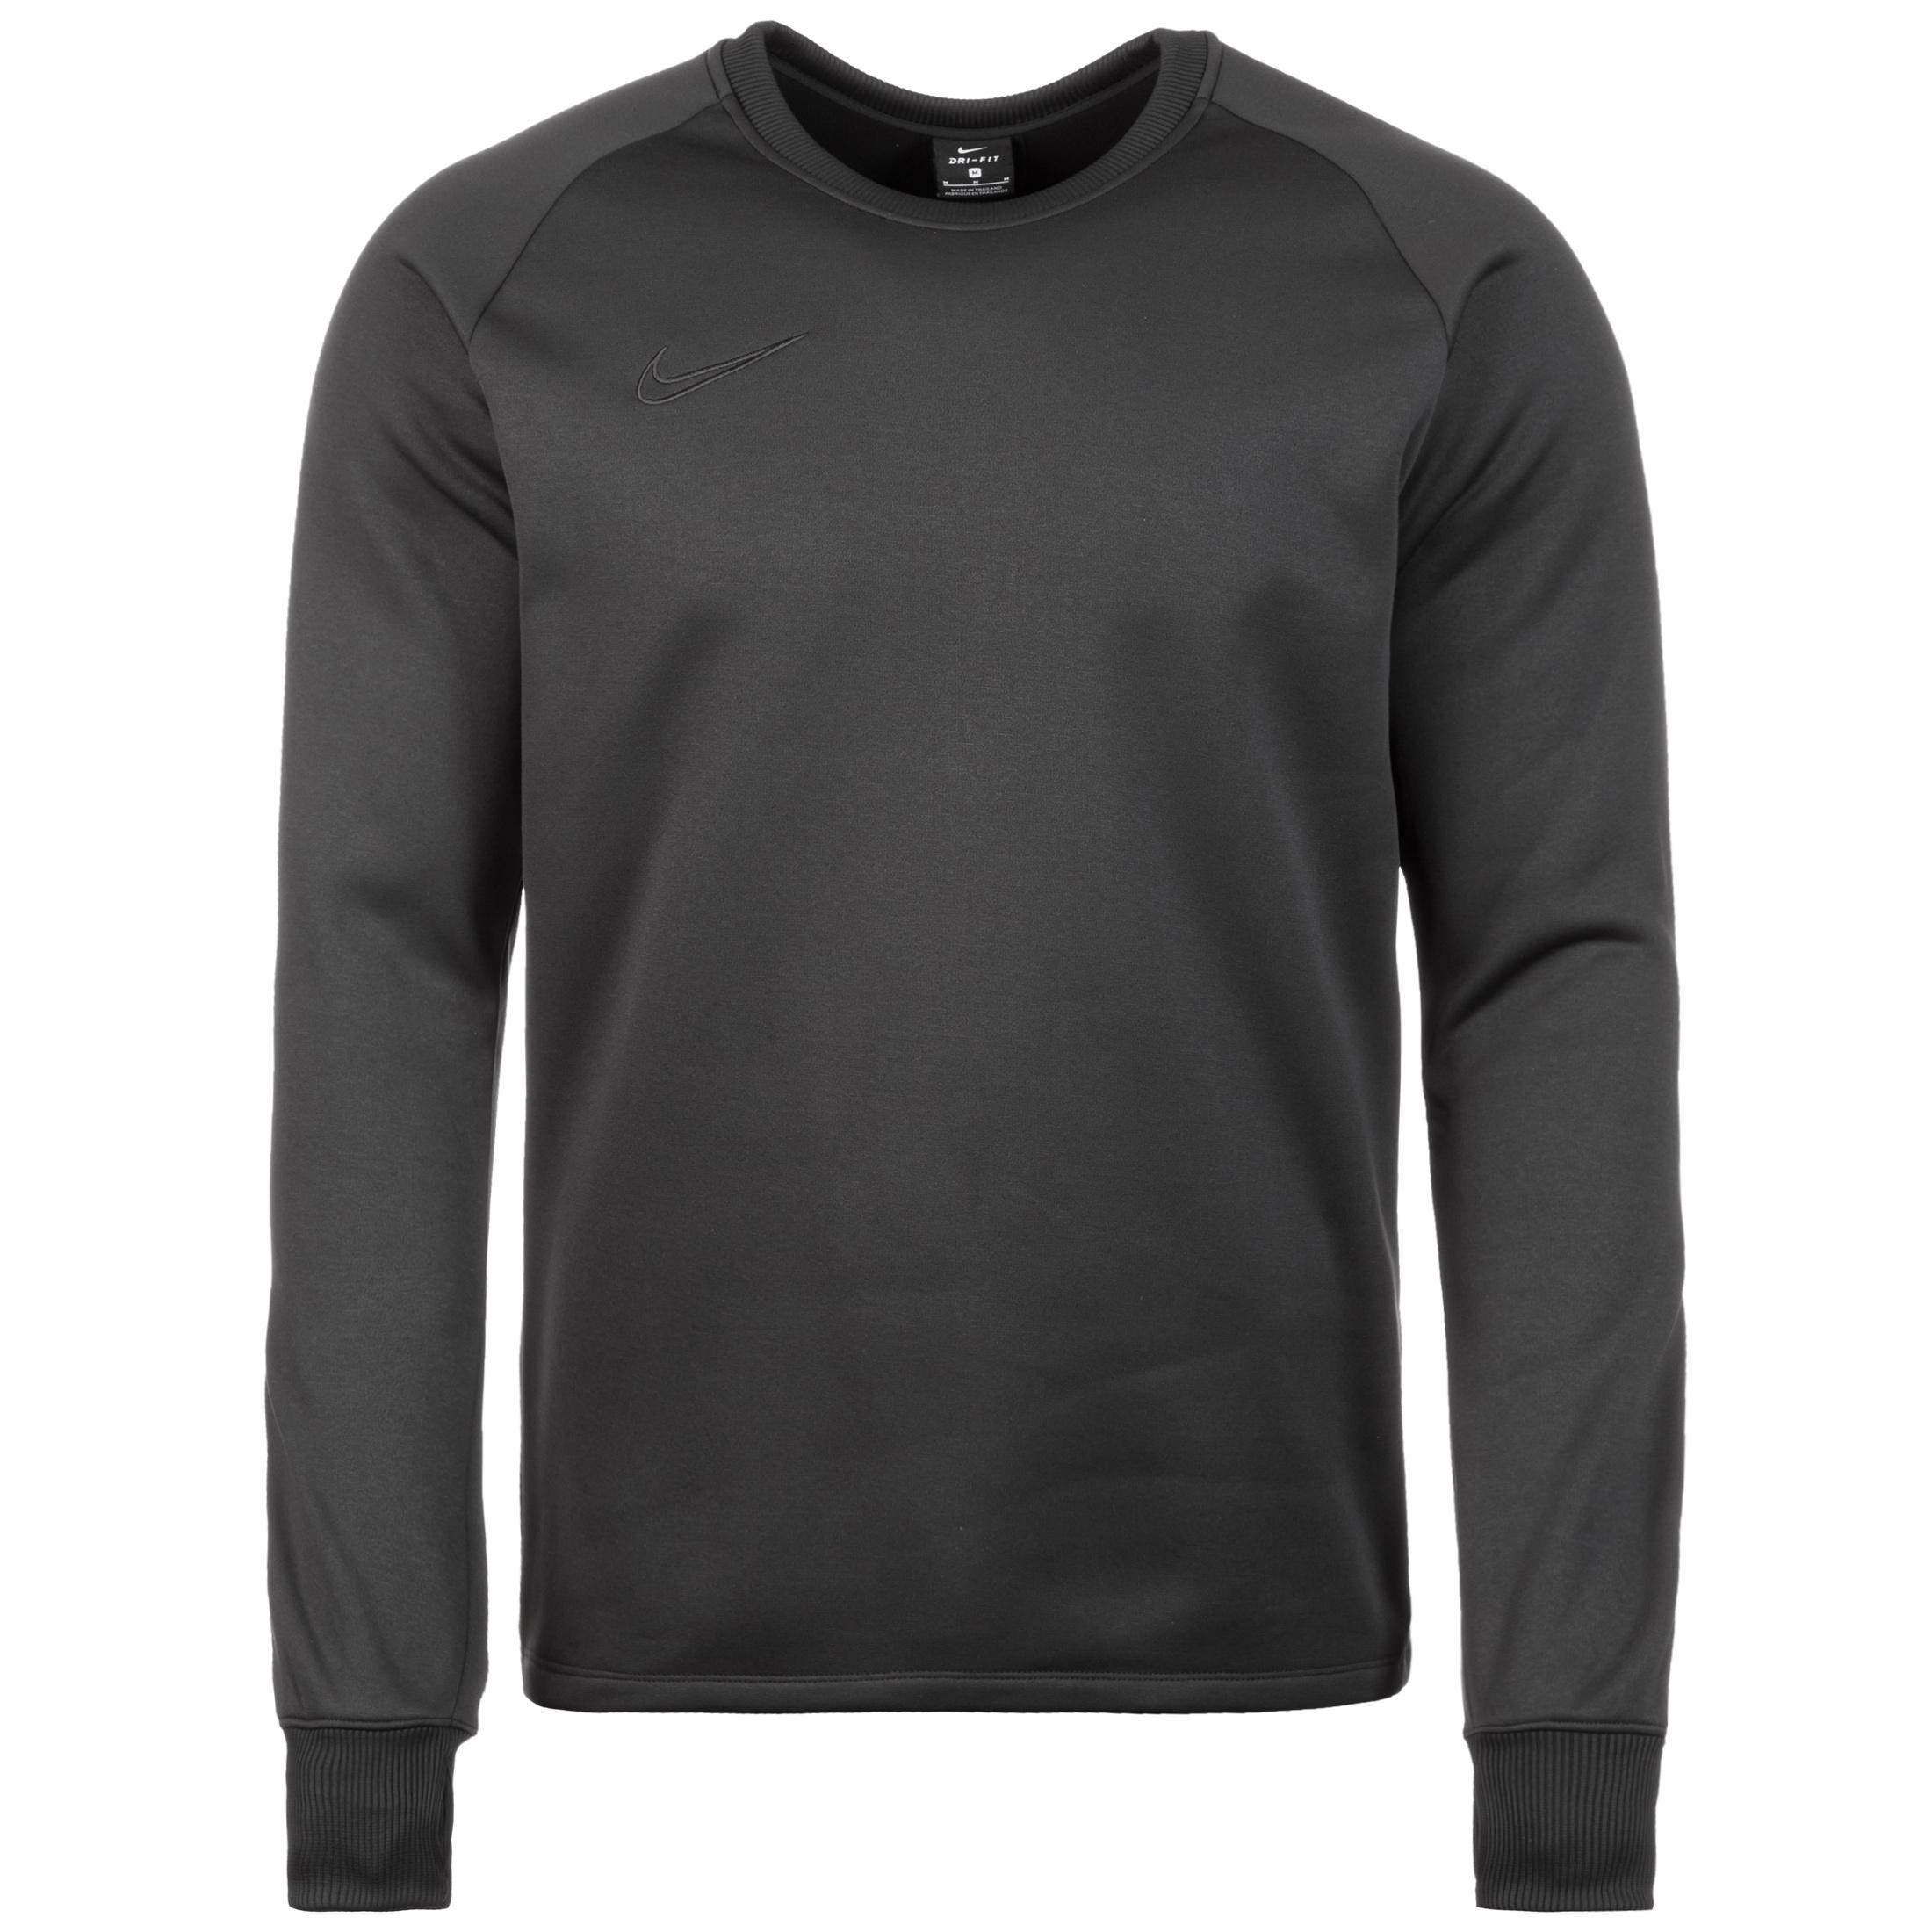 9e2cf59dd Nike Therma Academy Men's Long-Sleeve Football Top - Black | AO9189-010 |  FOOTY.COM